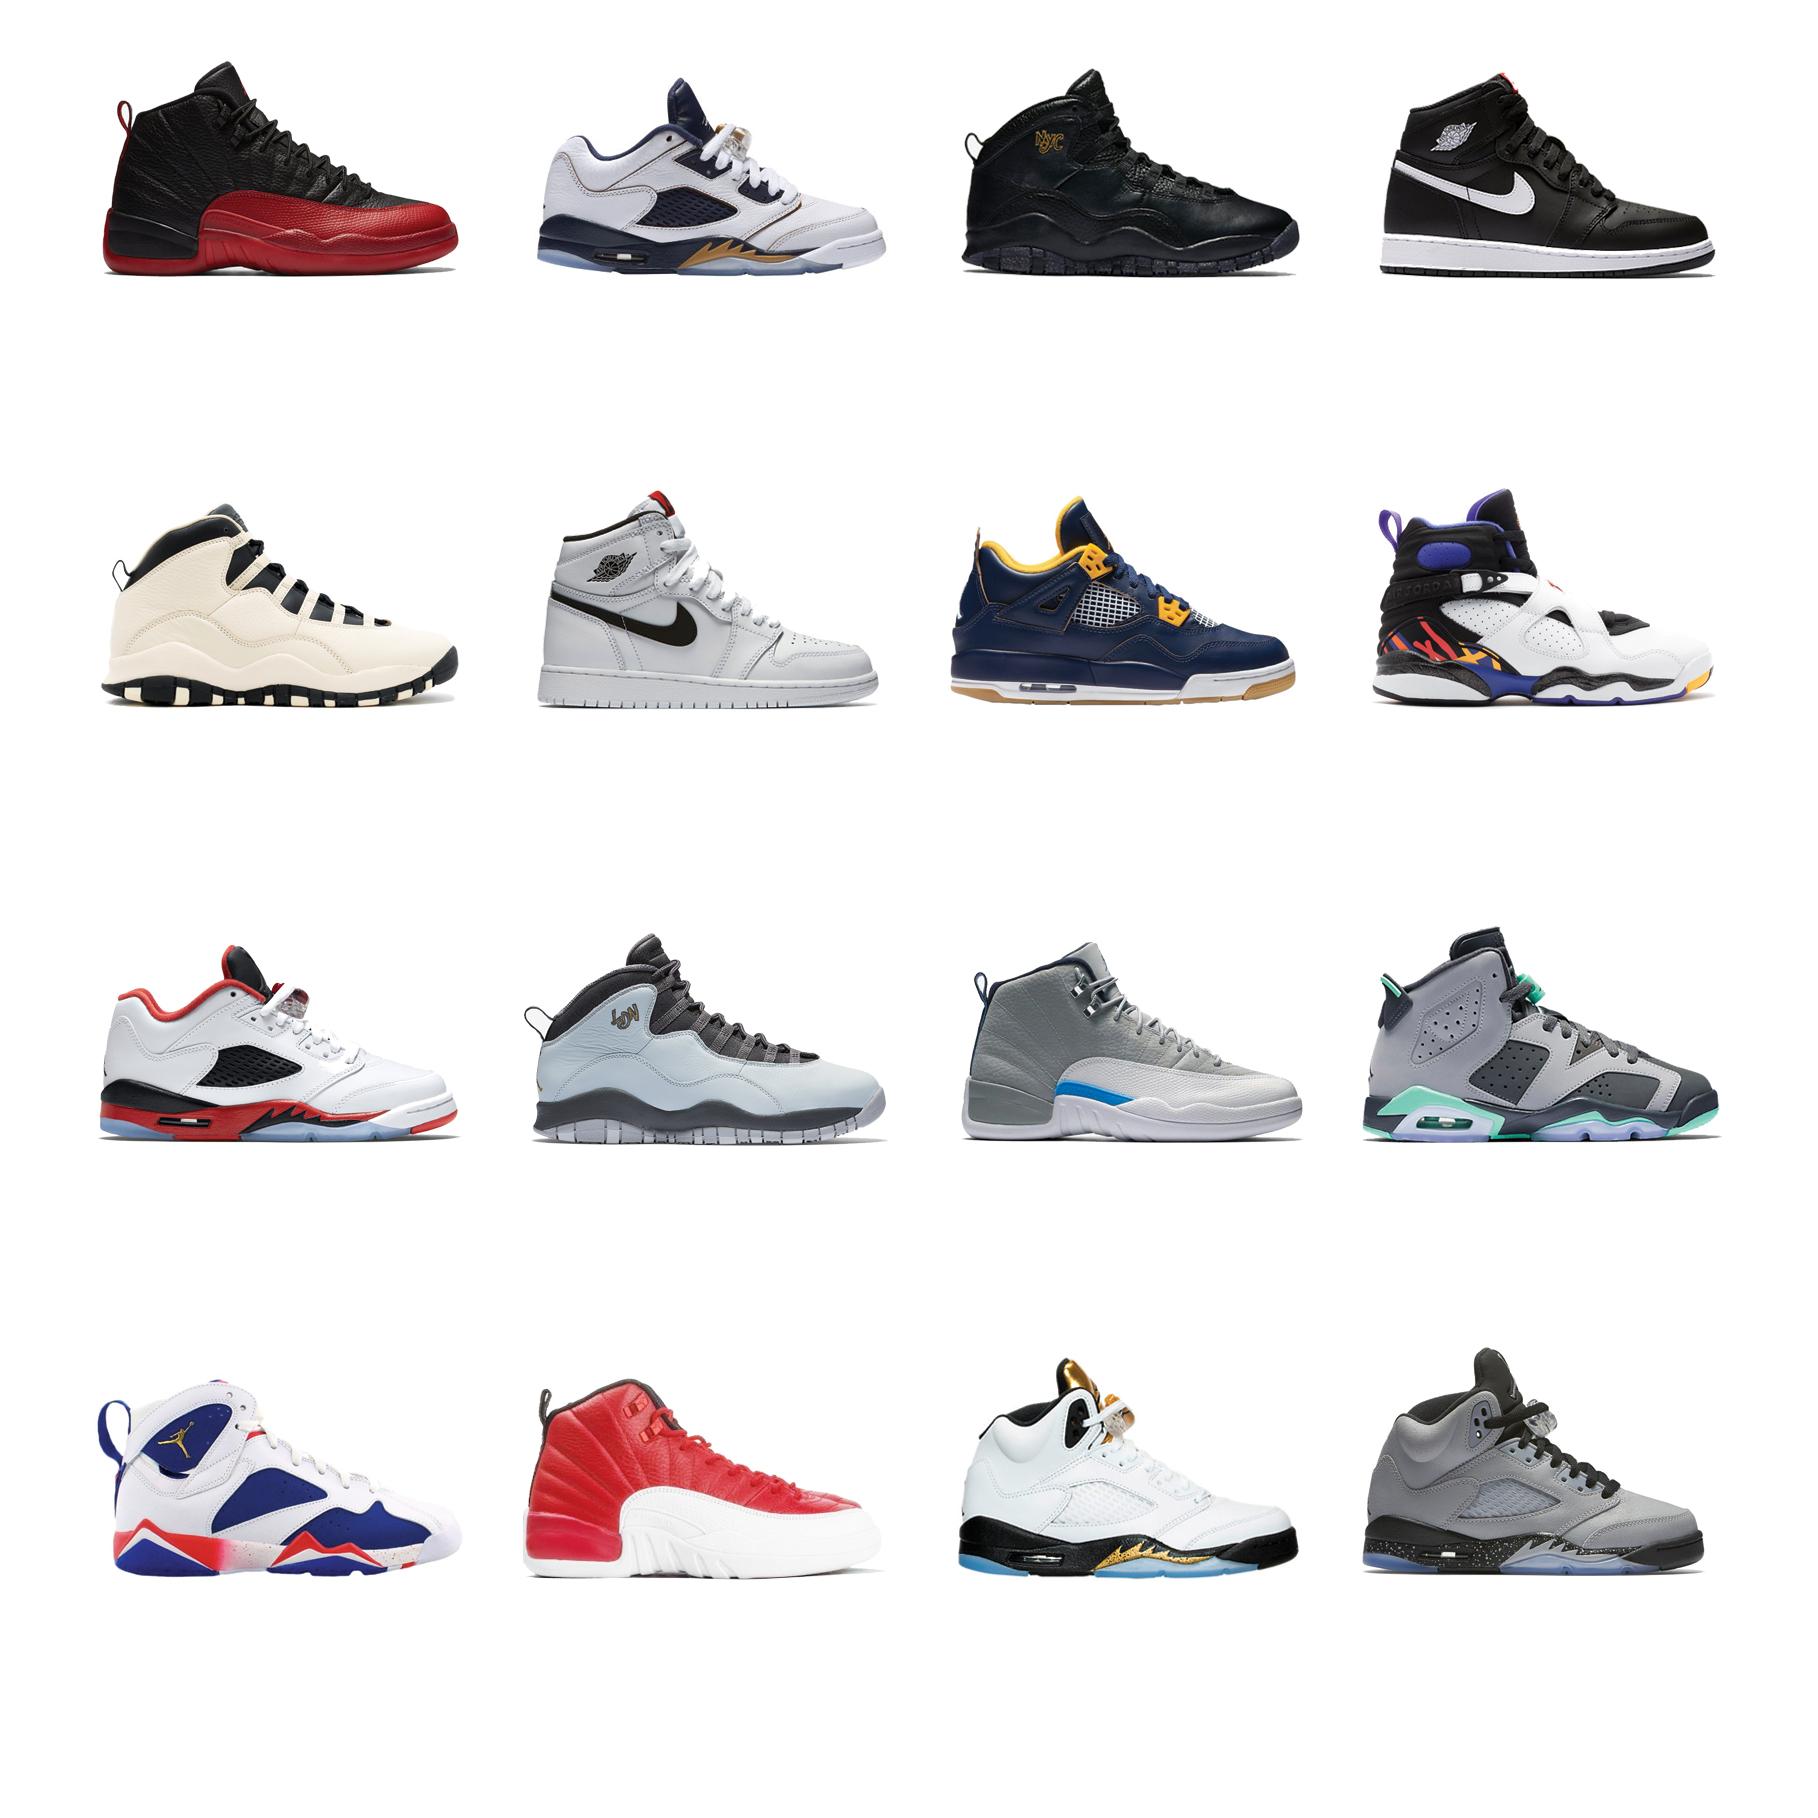 16 Air Jordan GS WAY Below Retail (Up